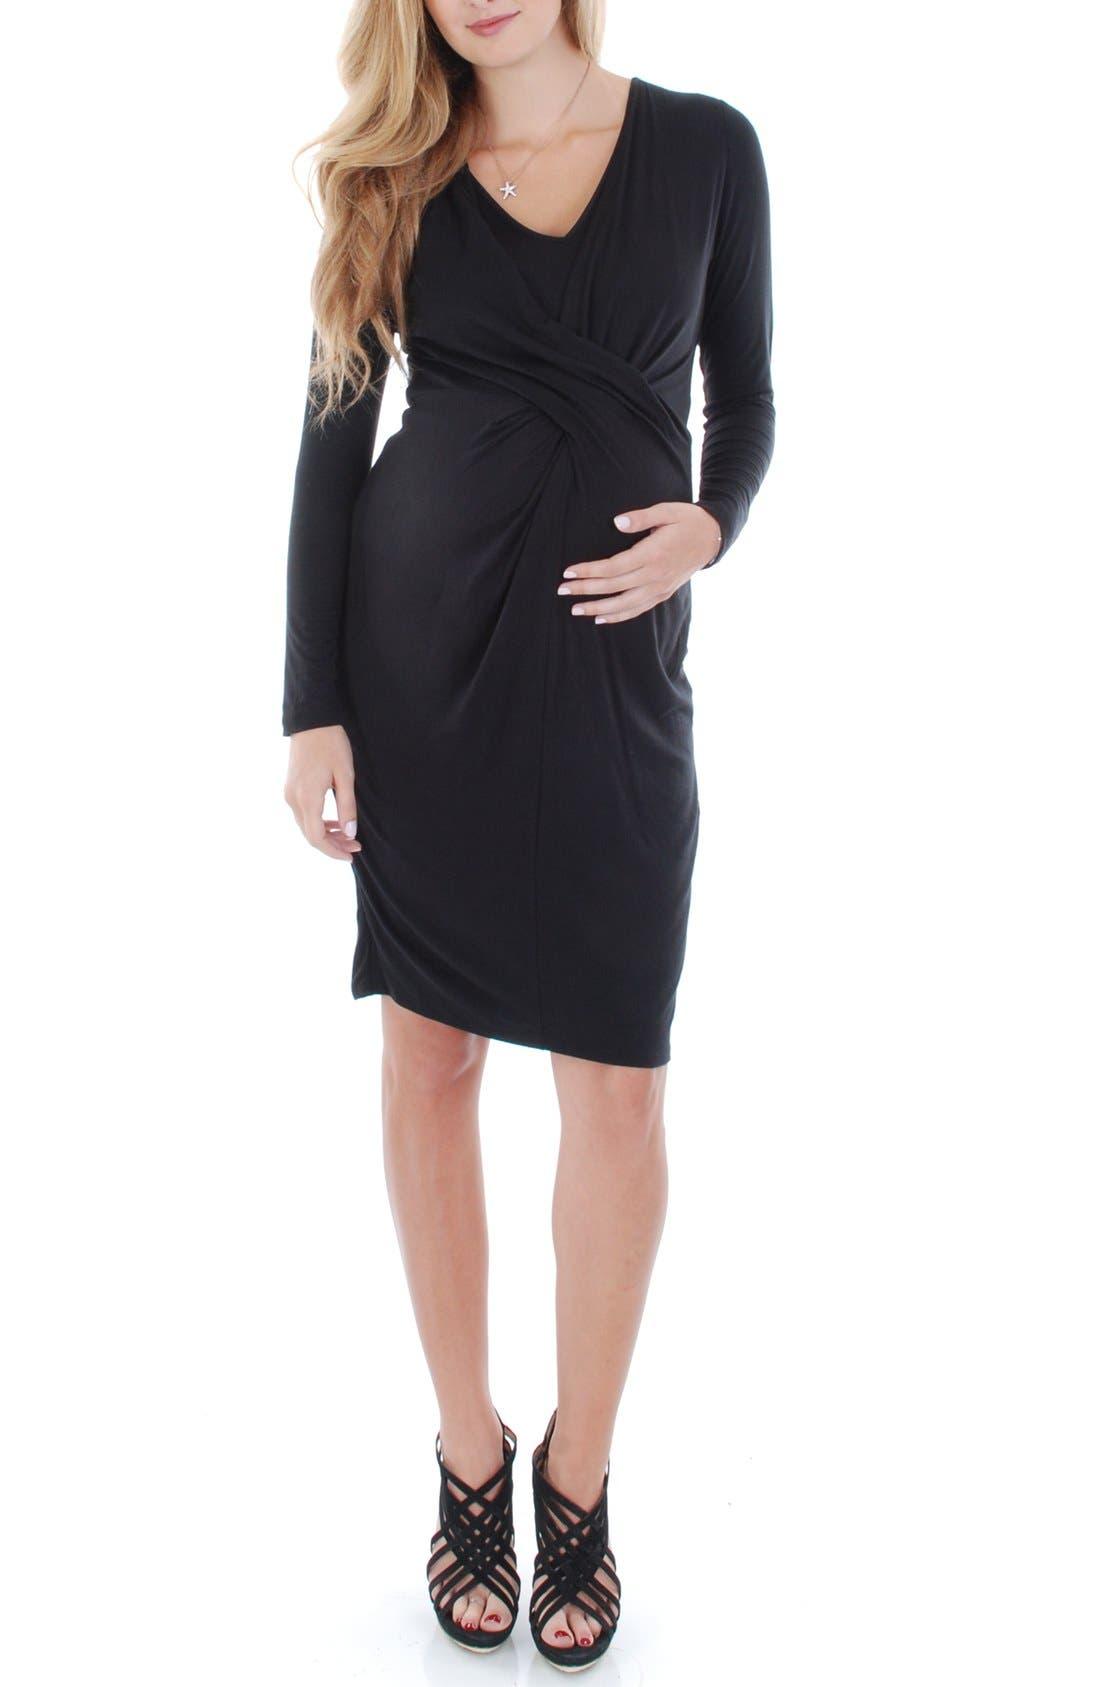 Alternate Image 1 Selected - Everly Grey 'Sloan' Maternity/Nursing Dress